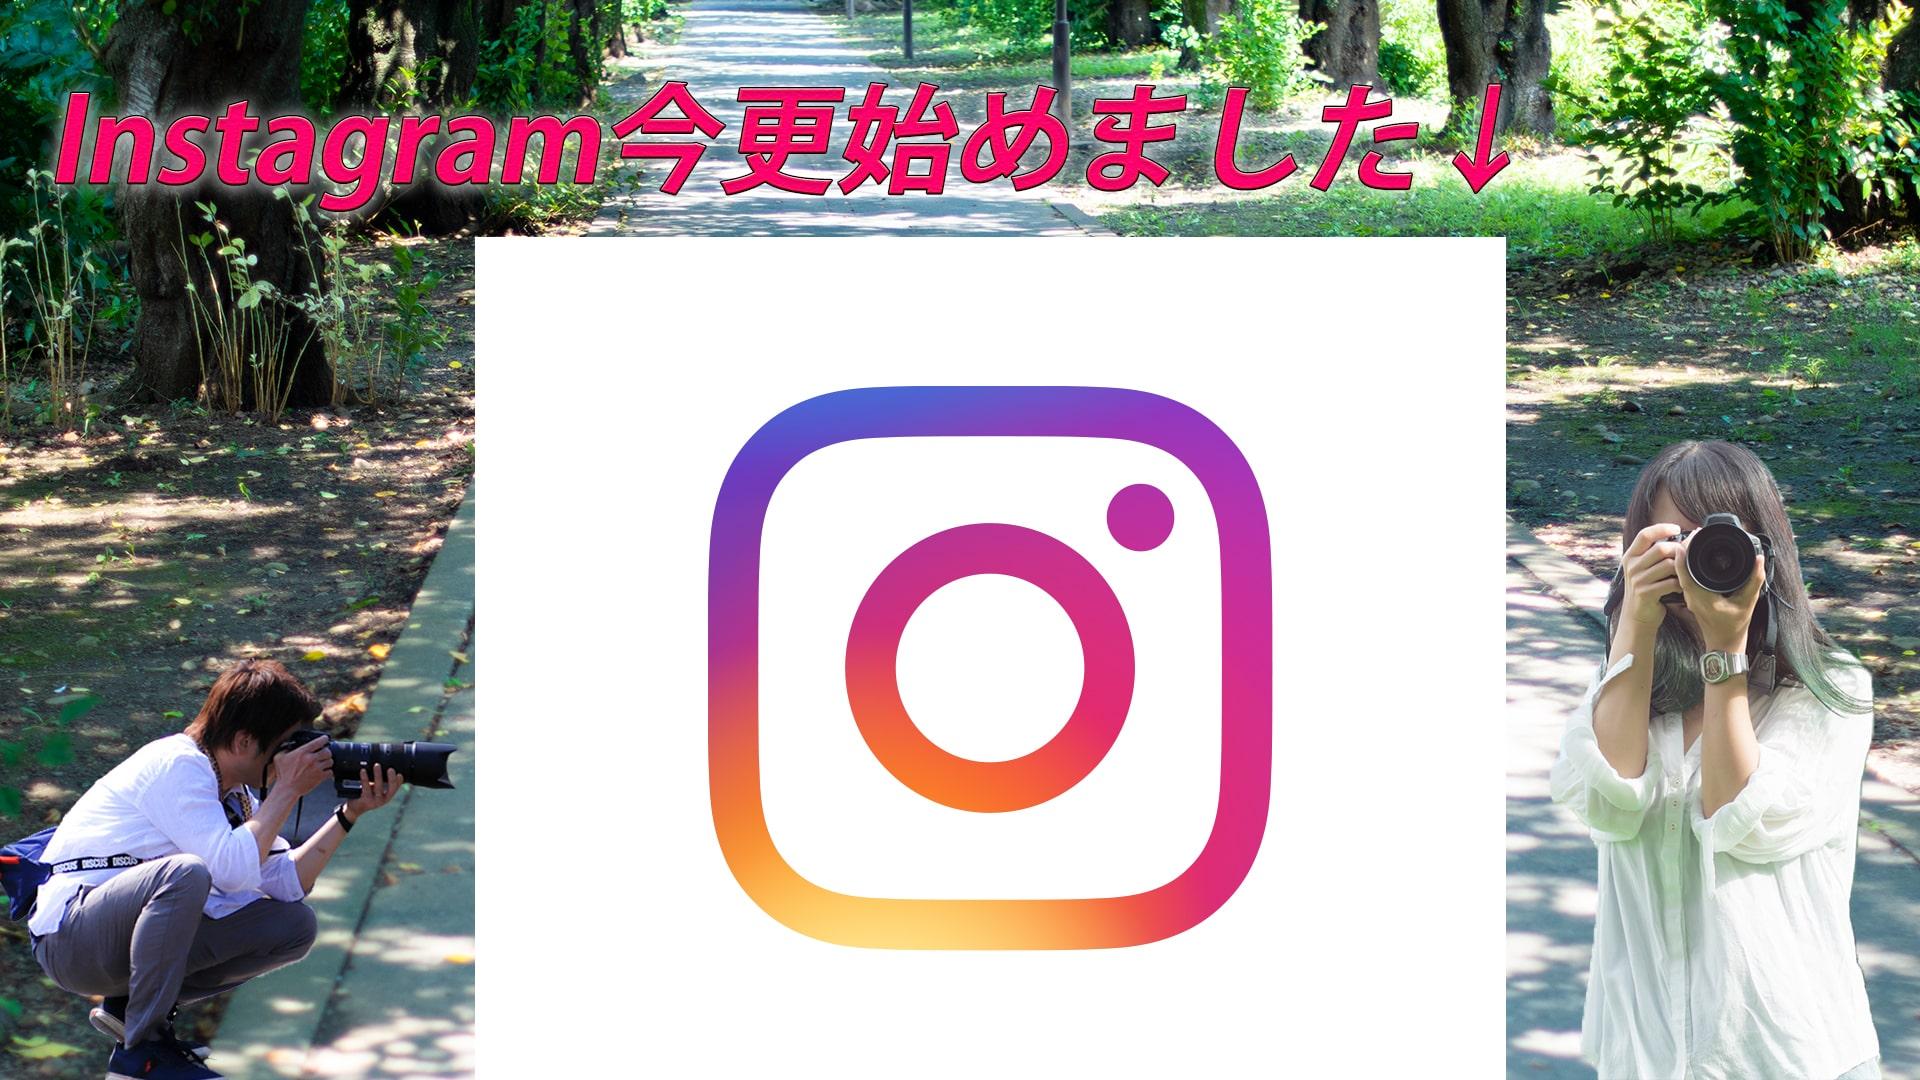 Instagram始めました!カメラを上手くなる為には評価が不可欠!